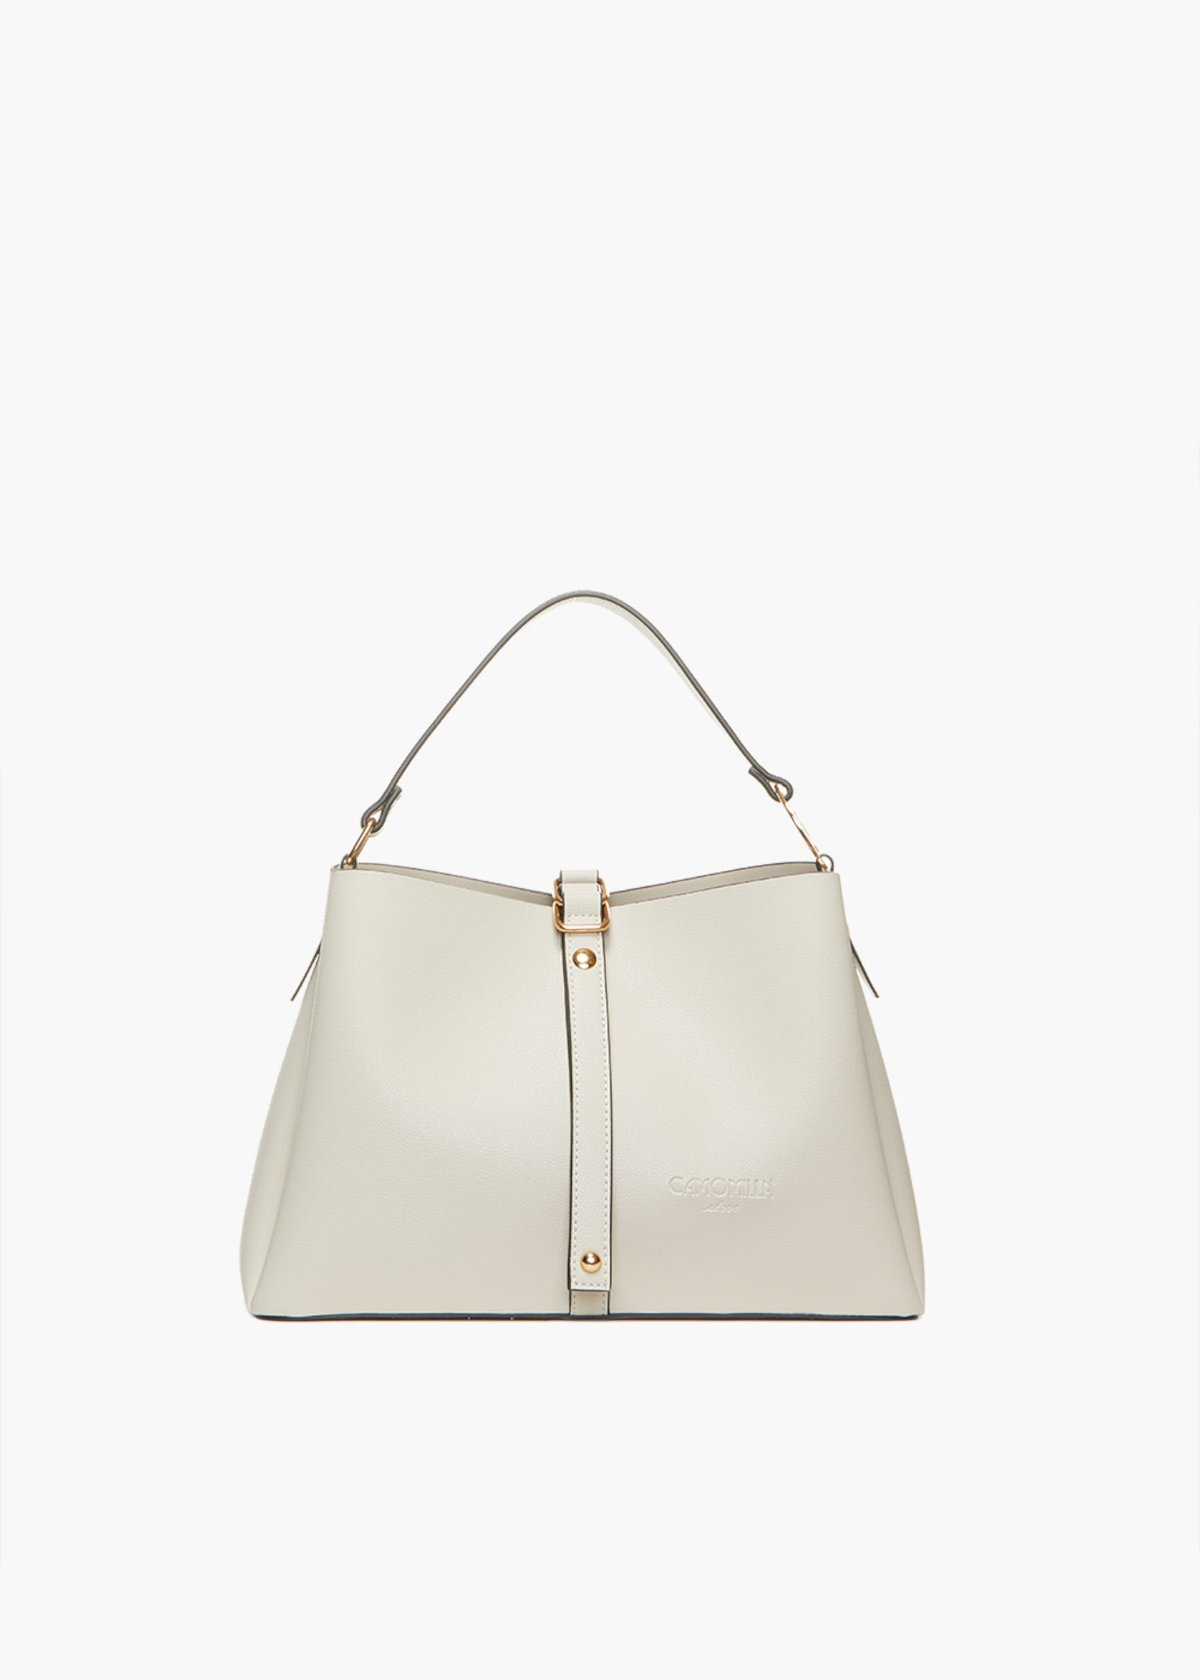 Handles bag Brynn con tracolla - Light Beige - Donna - Immagine categoria